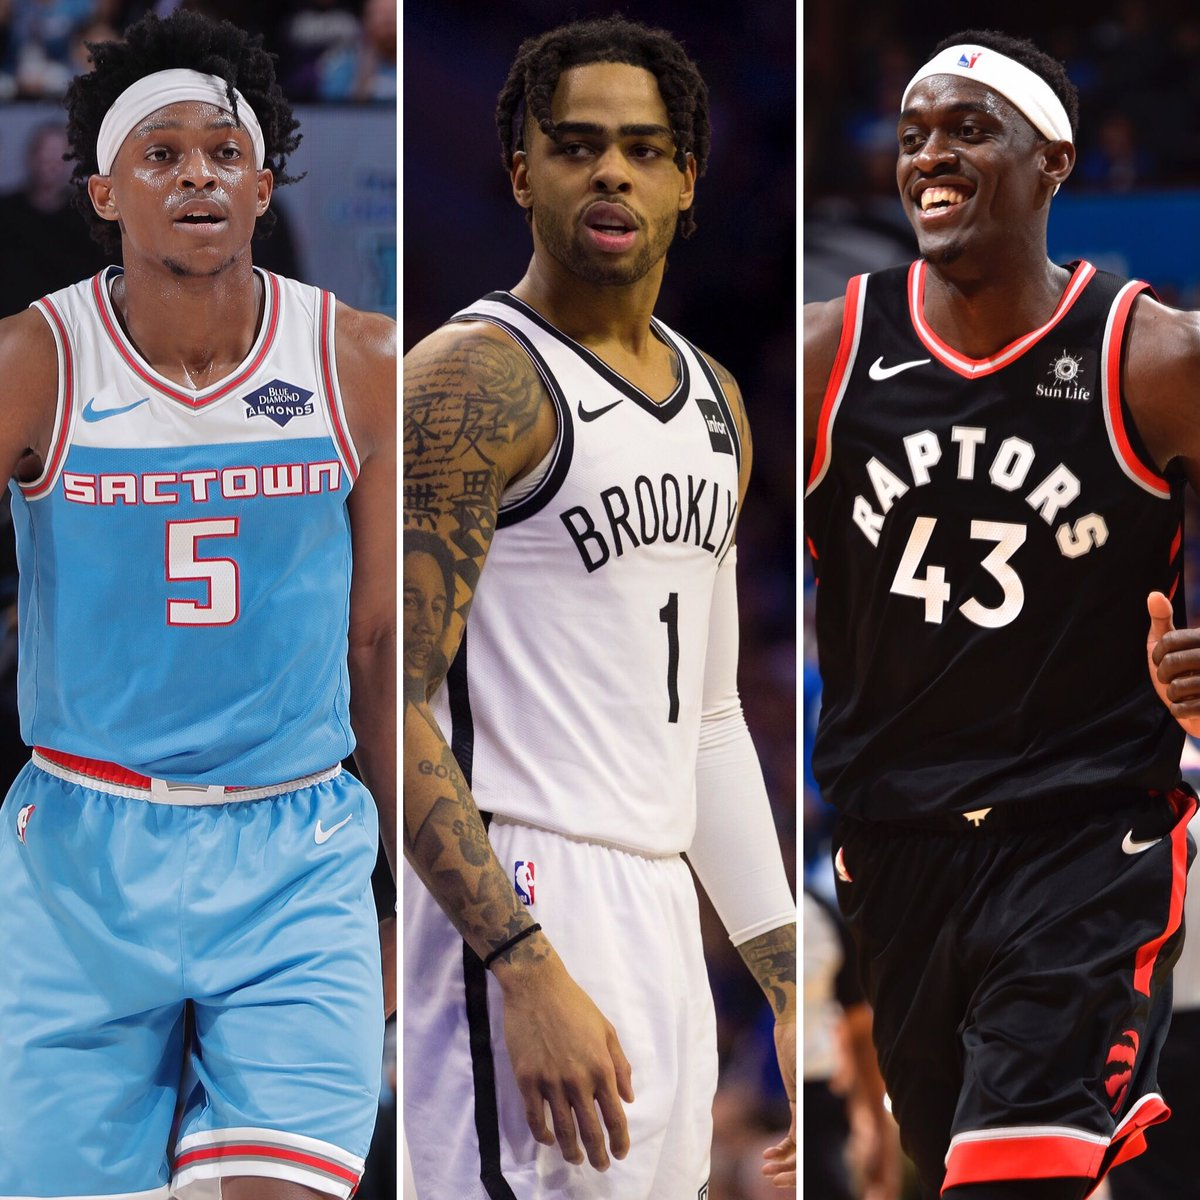 NBA on ESPN's photo on Pascal Siakam